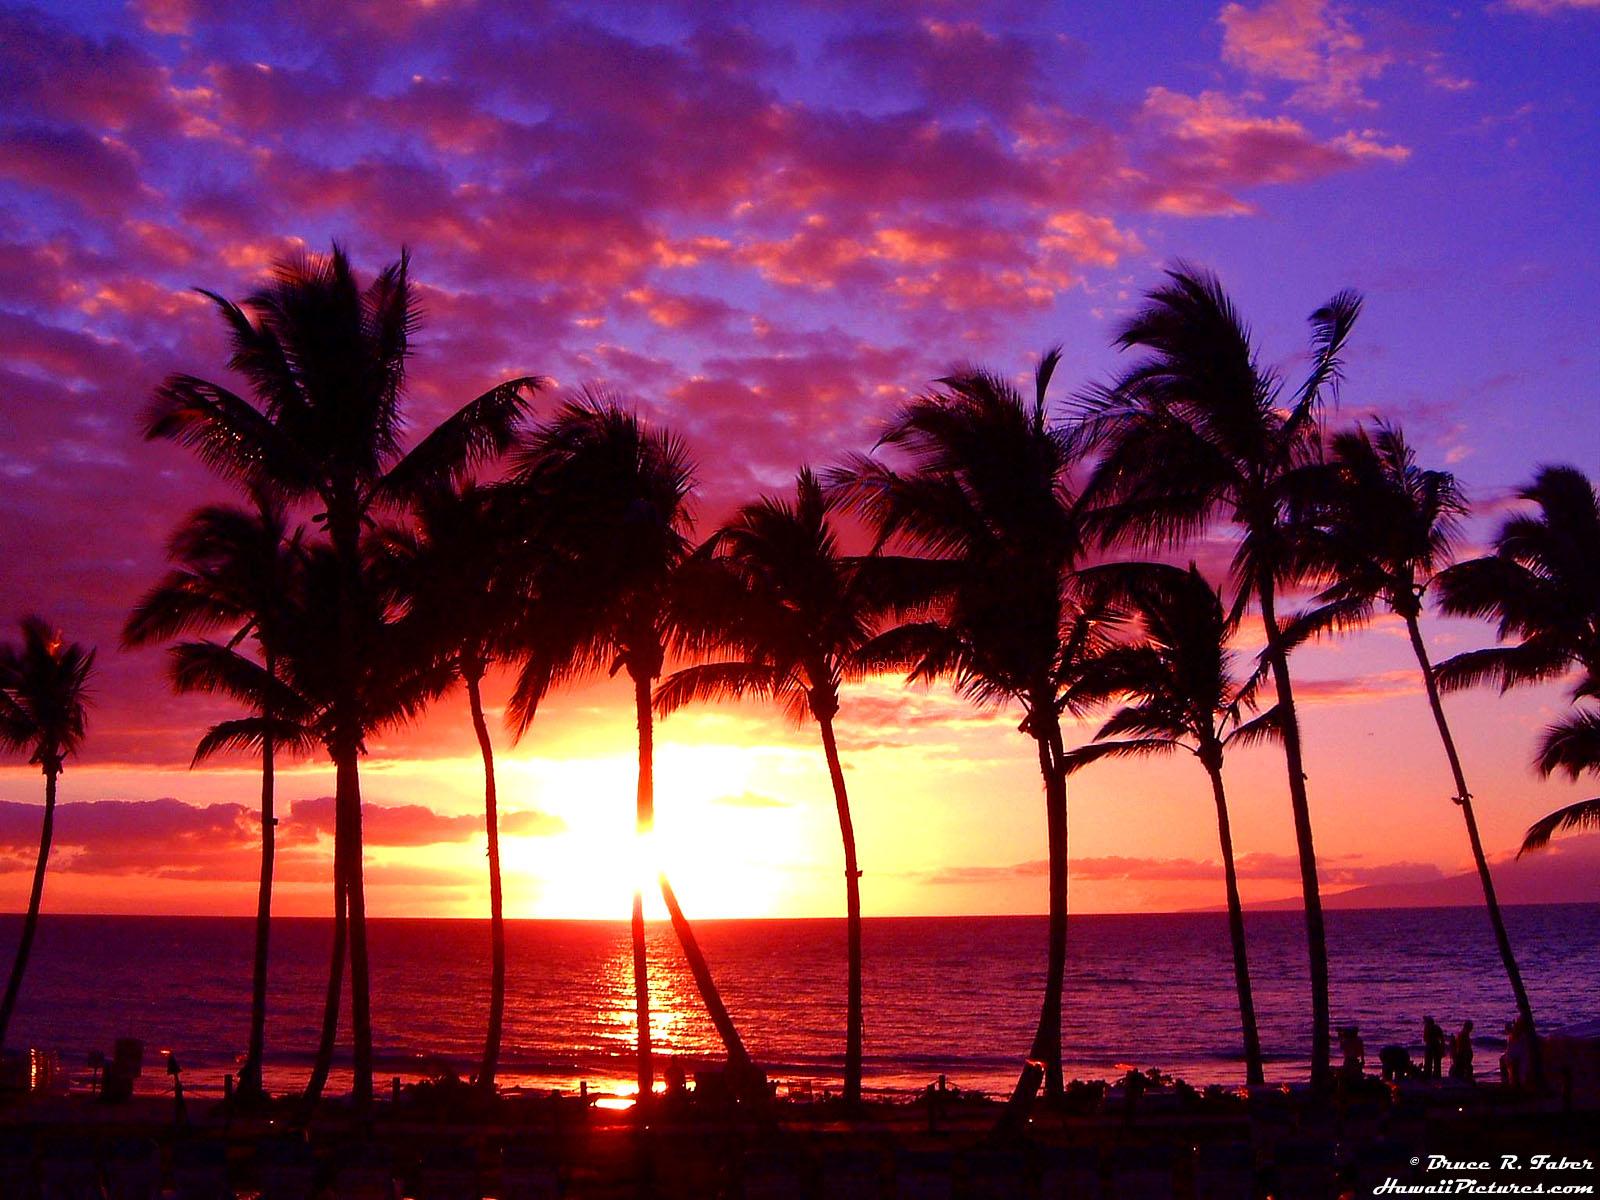 Sunset at Maui Hawaii Wallpaper | Wallpup.com